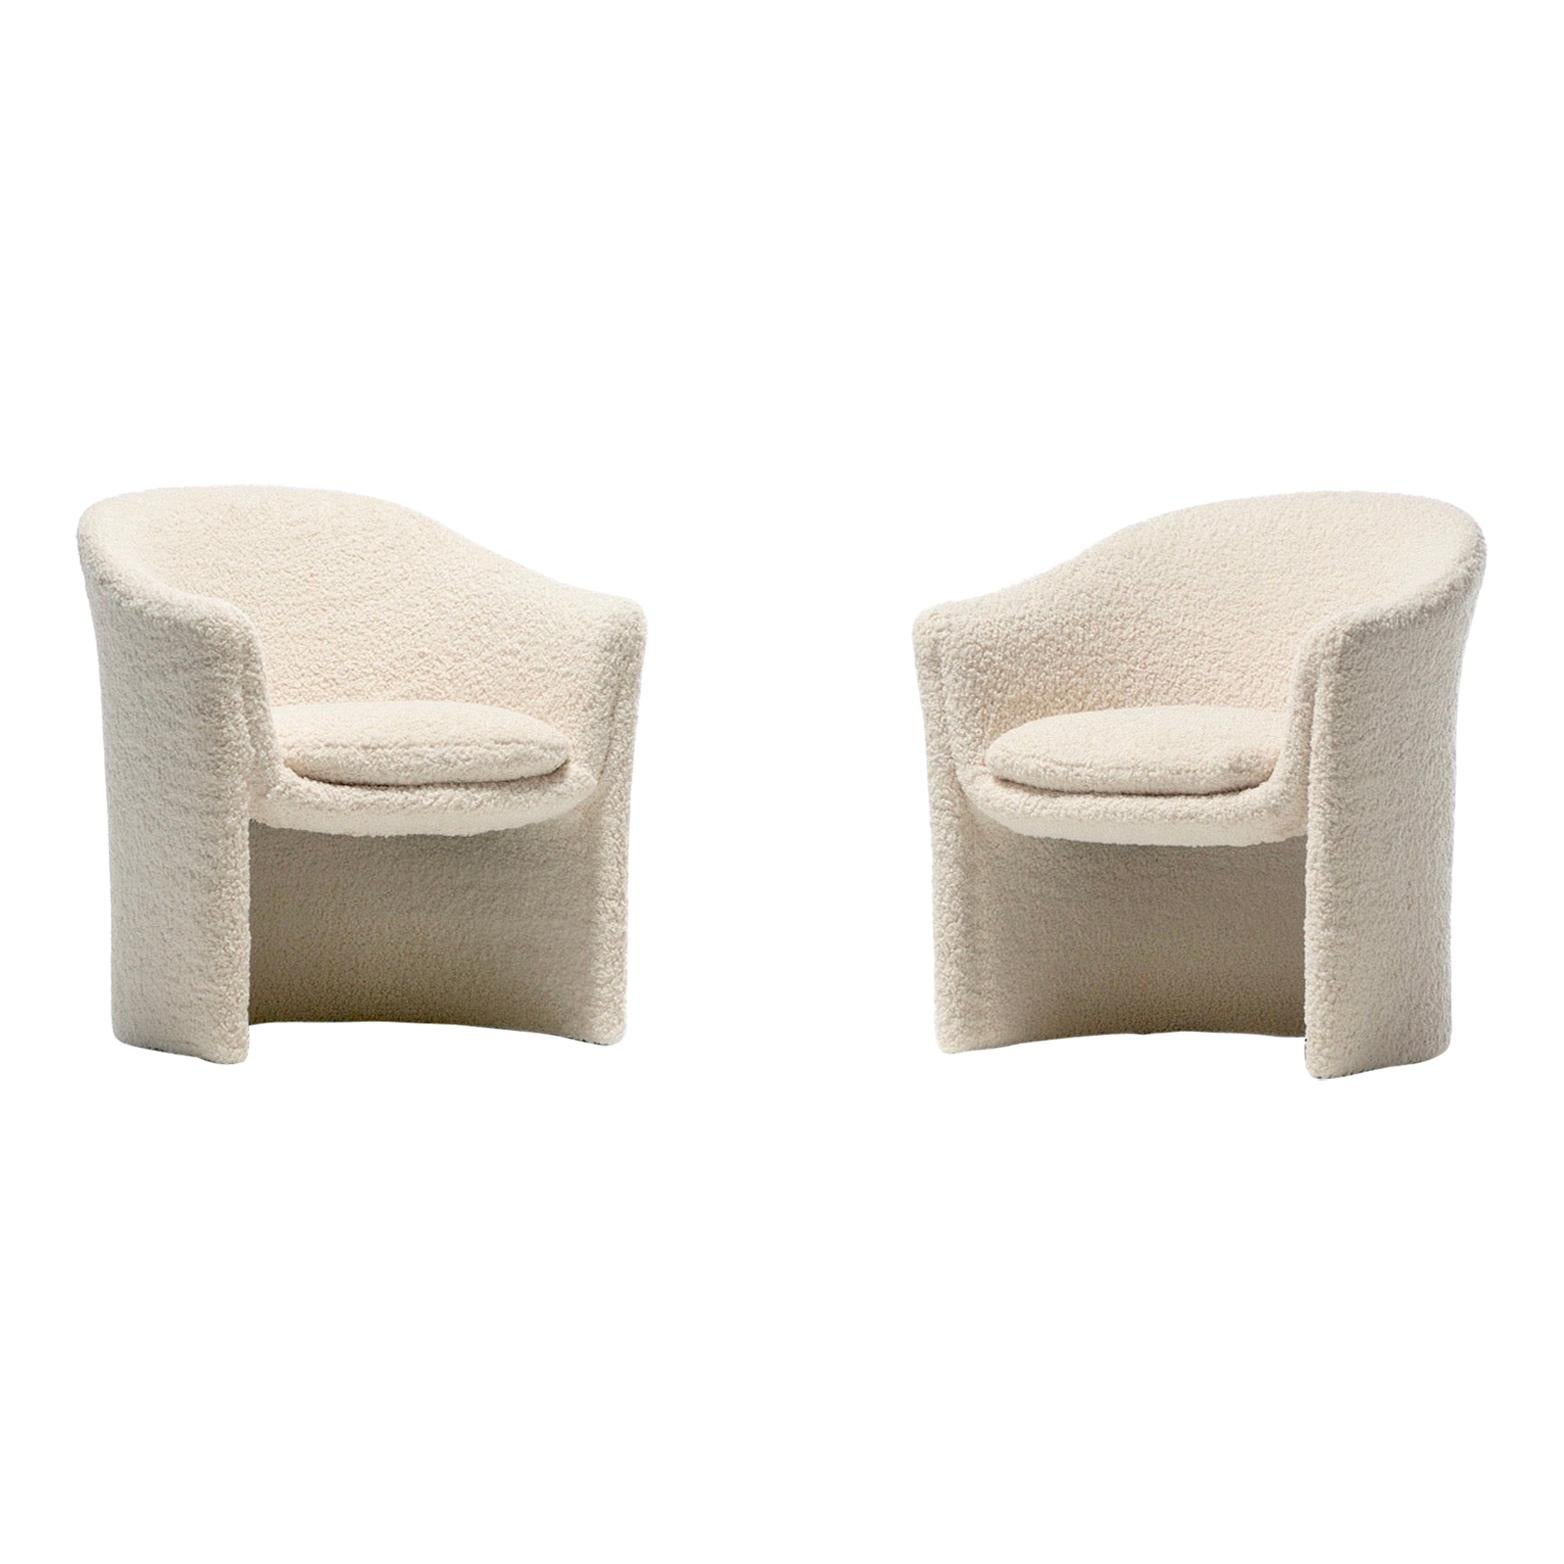 Pair of 1970s Sculptural Dunbar Chairs in Ivory Bouclé